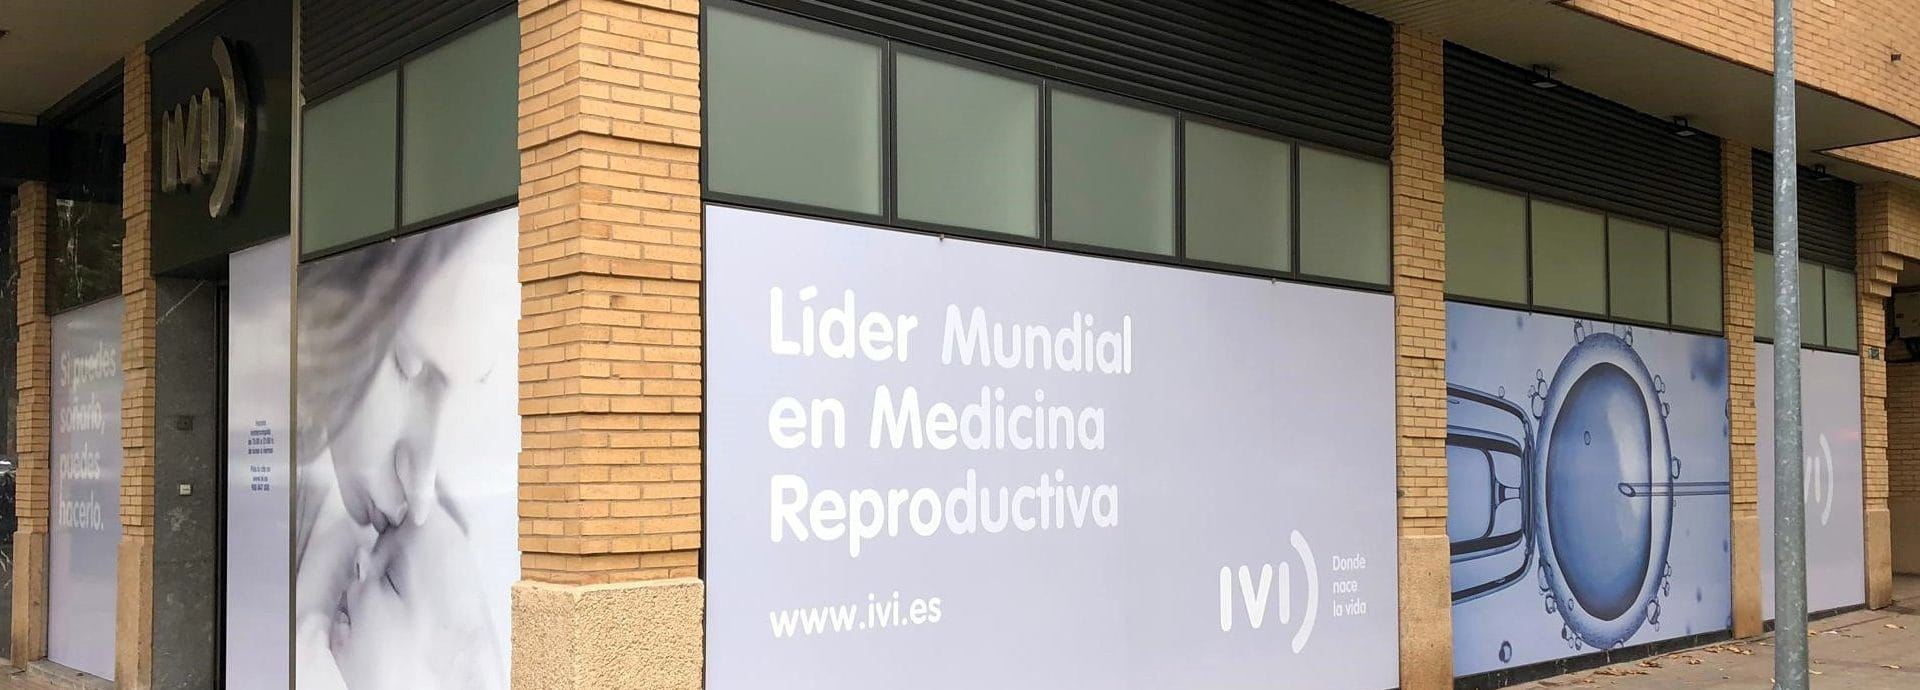 clínica fertilidad vi Logroño desktop